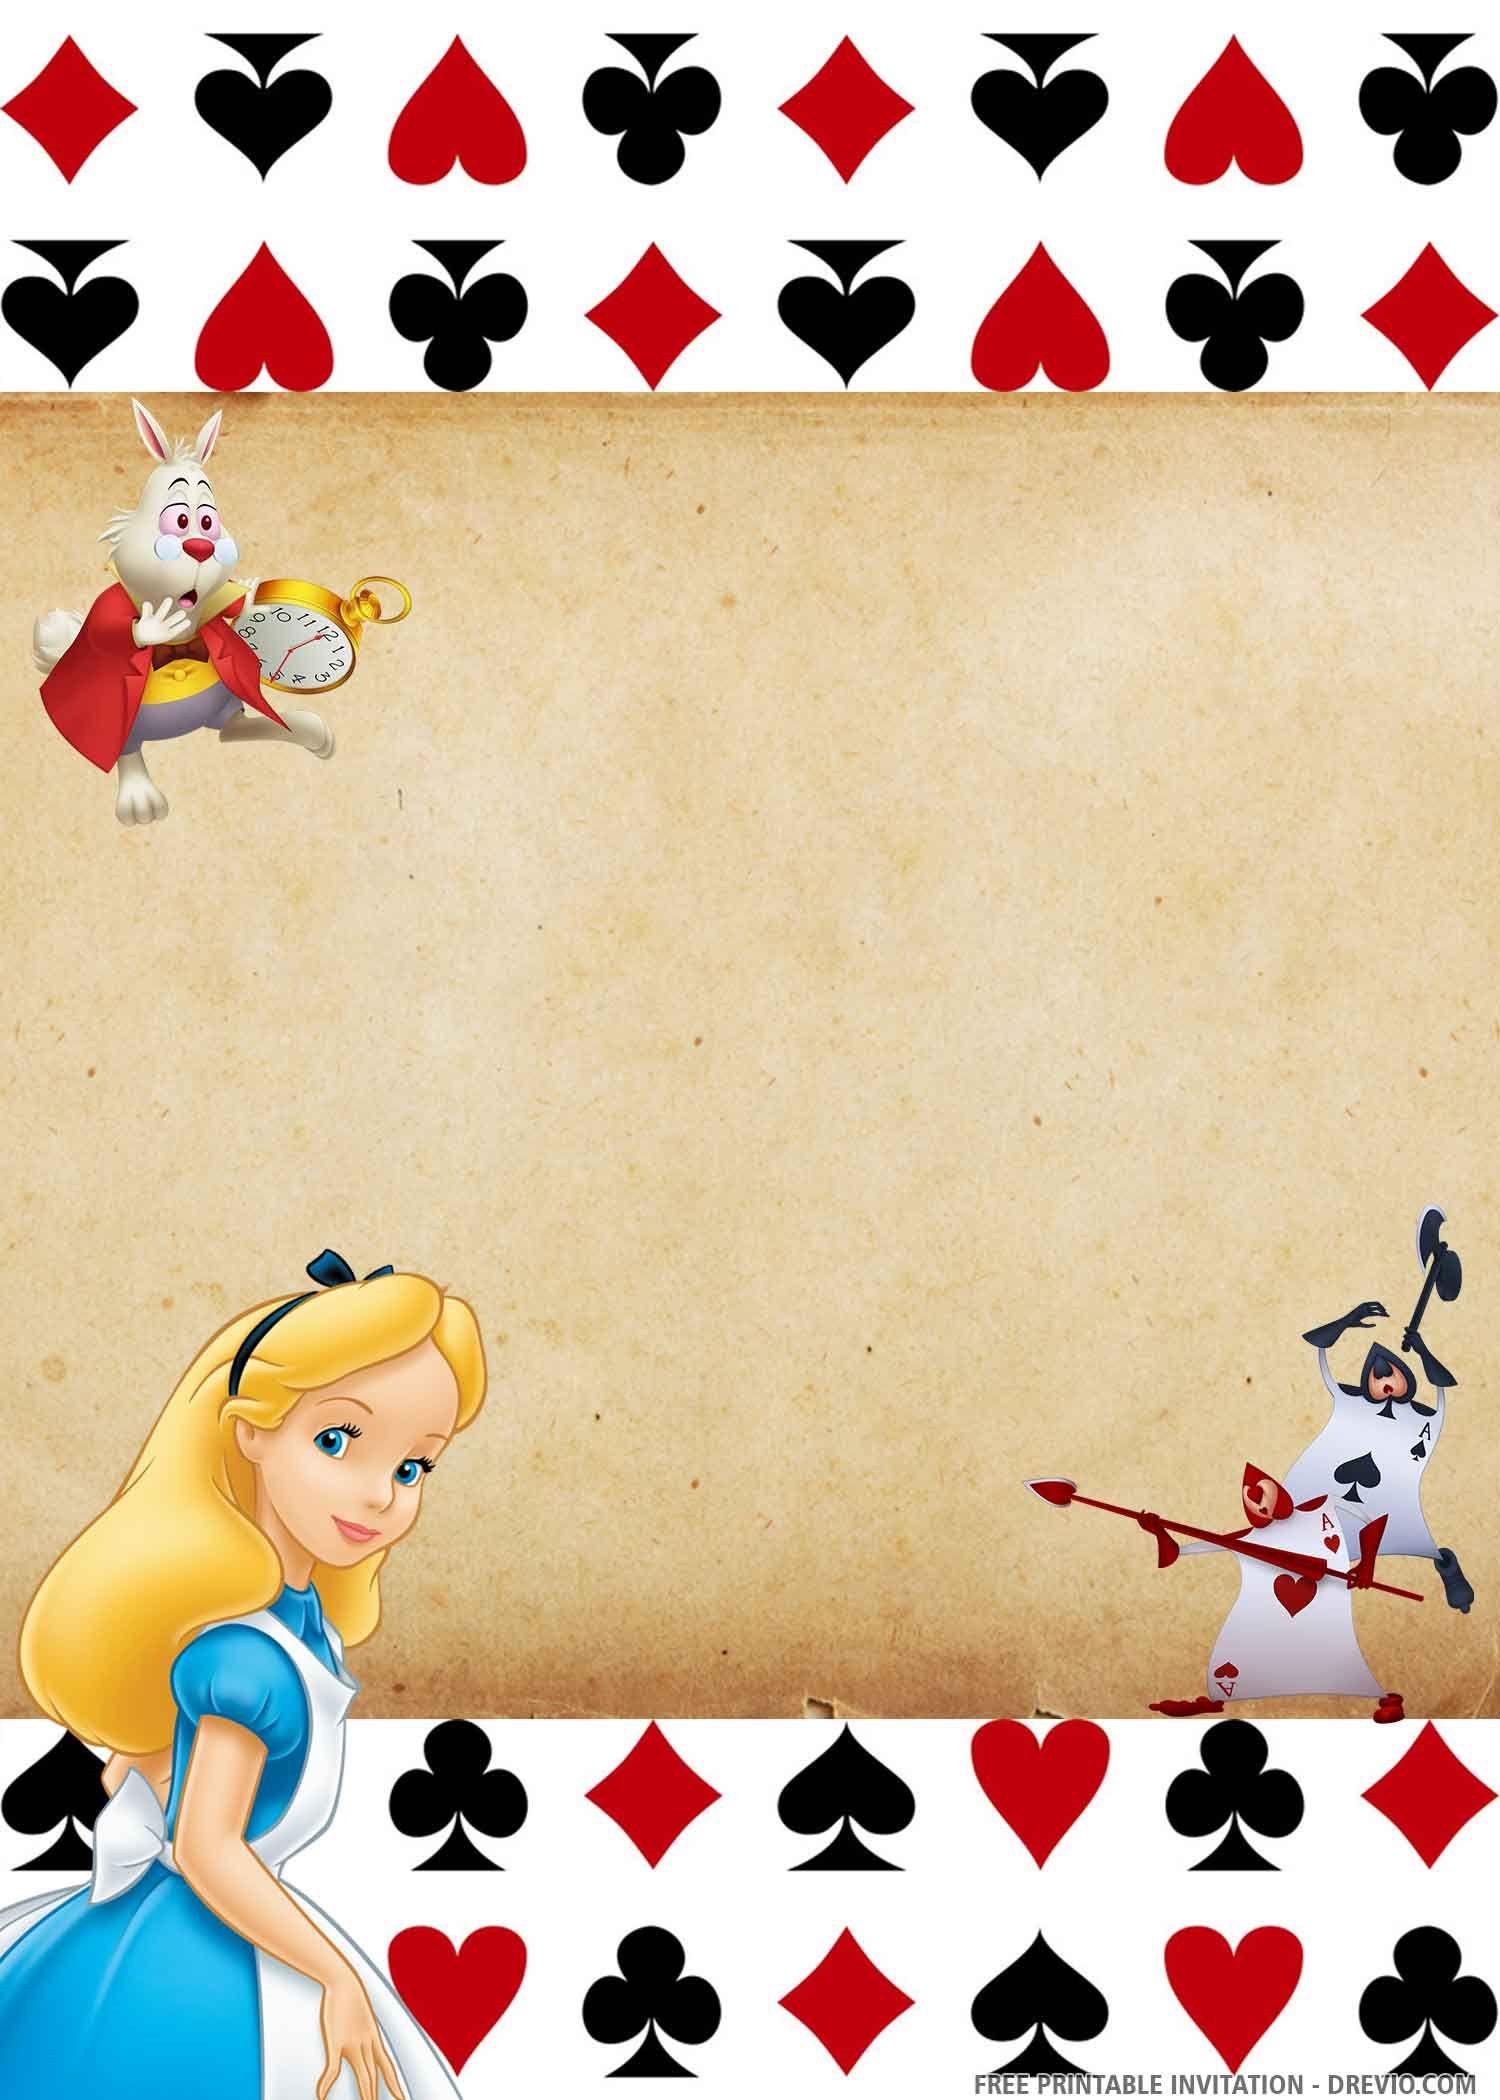 007 Astounding Alice In Wonderland Invitation Template High Resolution  Templates Wedding Birthday Free Tea PartyFull